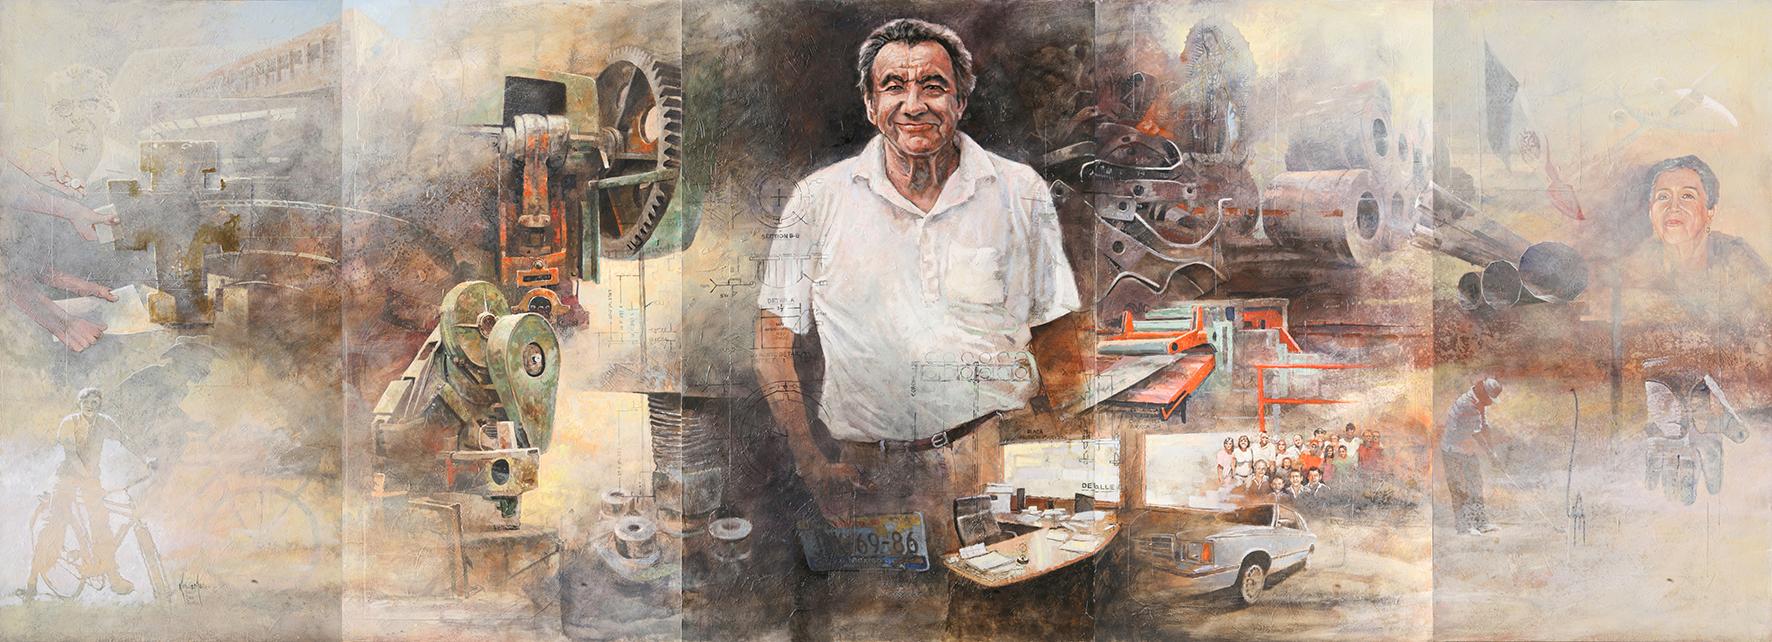 HERITAGE OF GONZALO RAMIREZ SANTANA